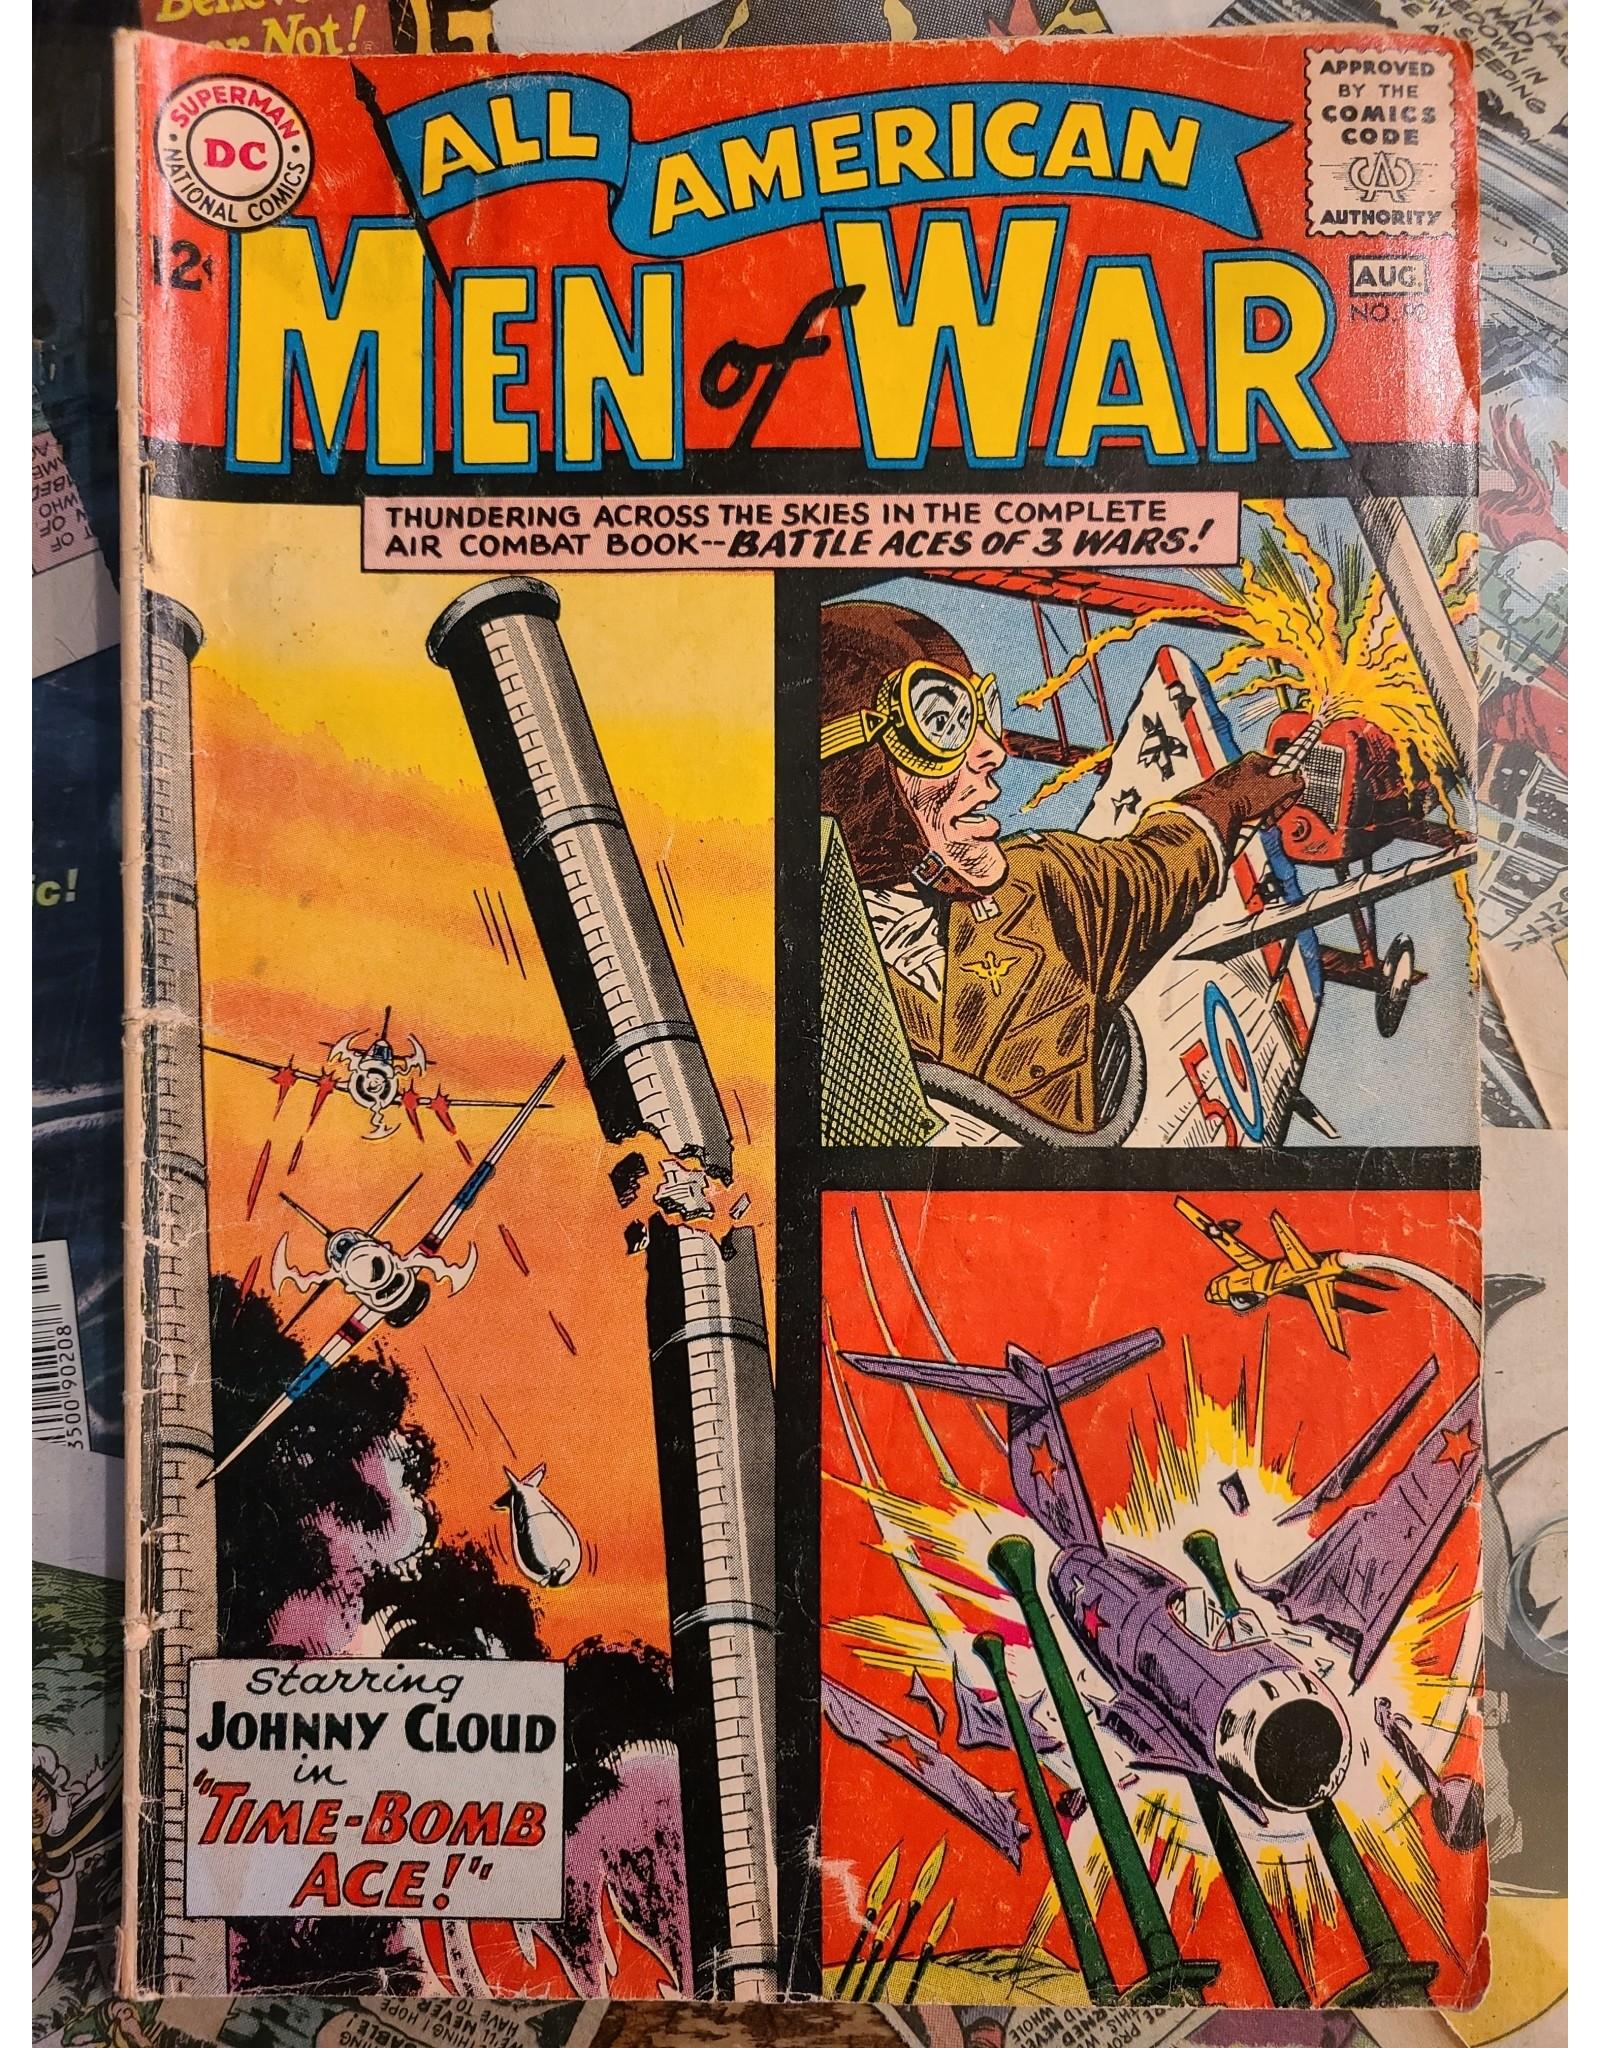 DC Comics ALL AMERICAN MEN OF WAR #98 VG-